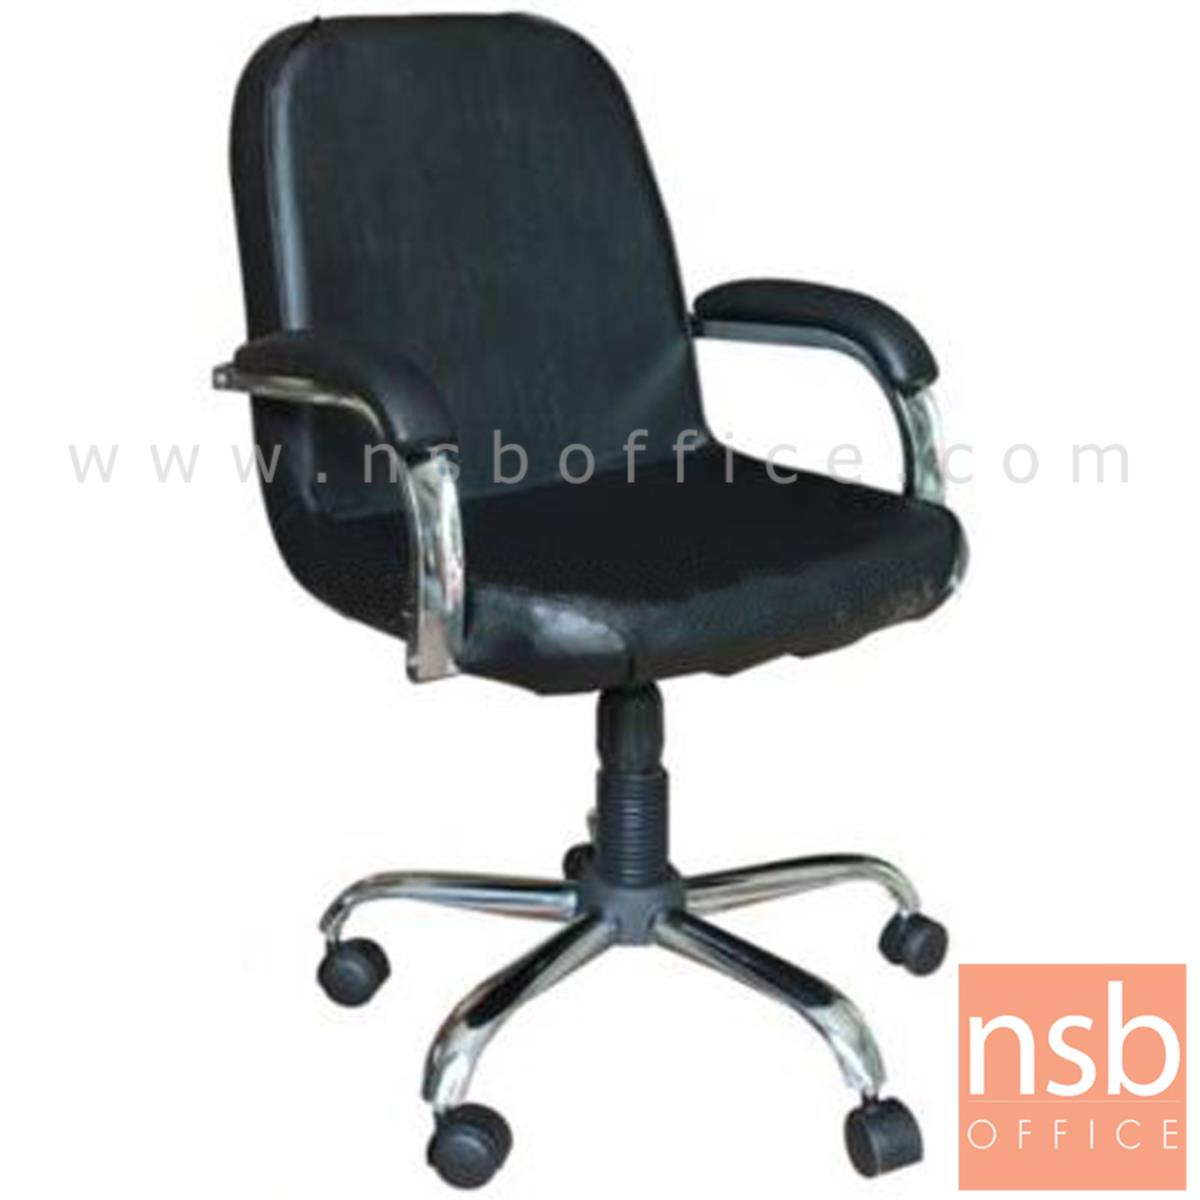 B03A086:เก้าอี้สำนักงาน รุ่น Rita (ริต้า) ขาเหล็ก